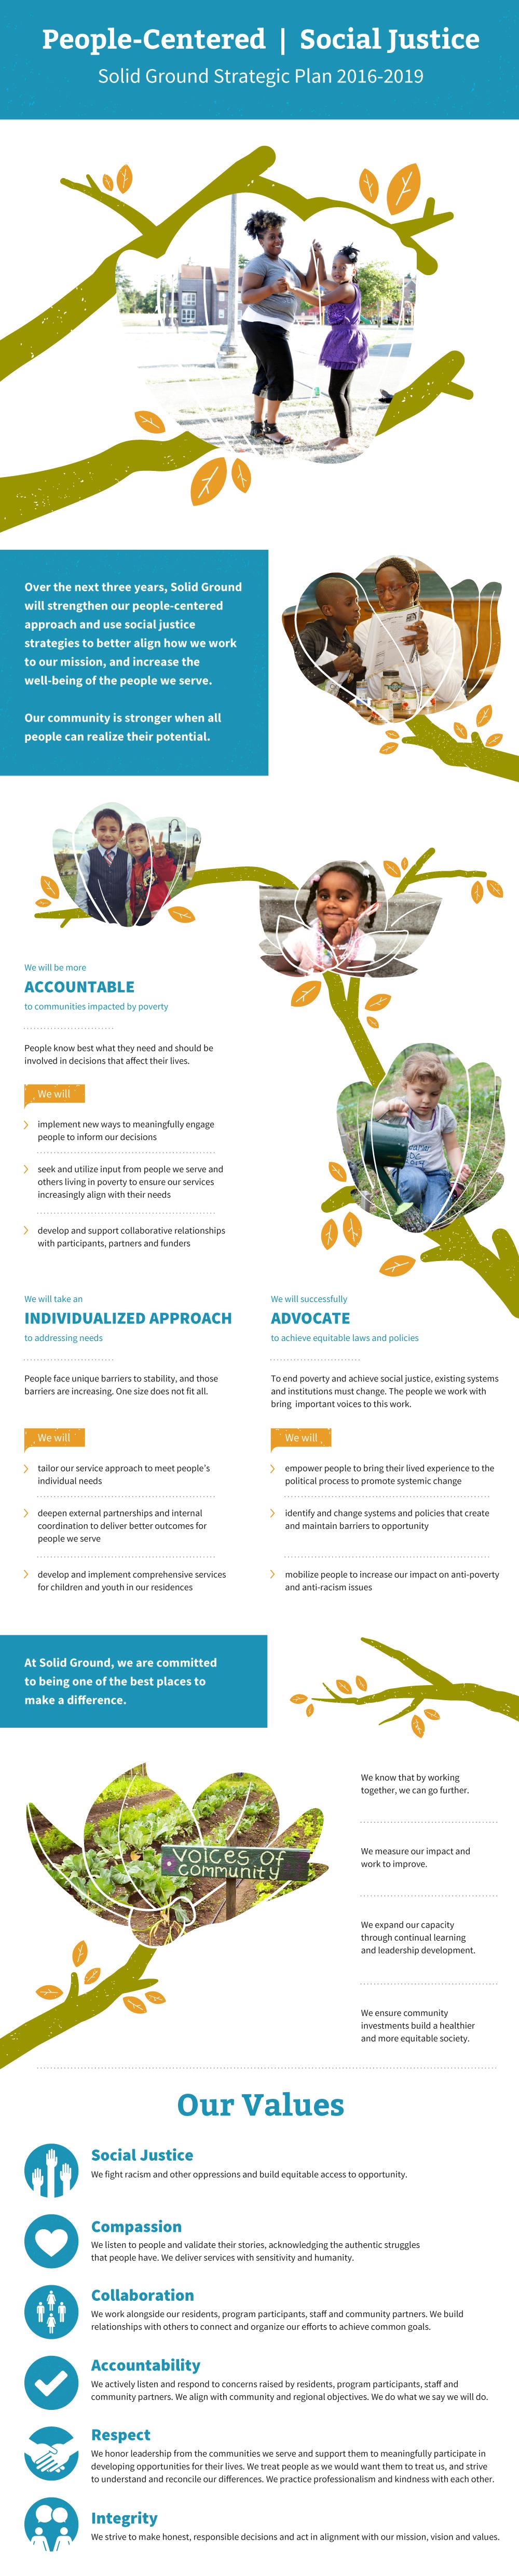 Inforgraphic of Solid Ground's 2016-2019 strategic plan